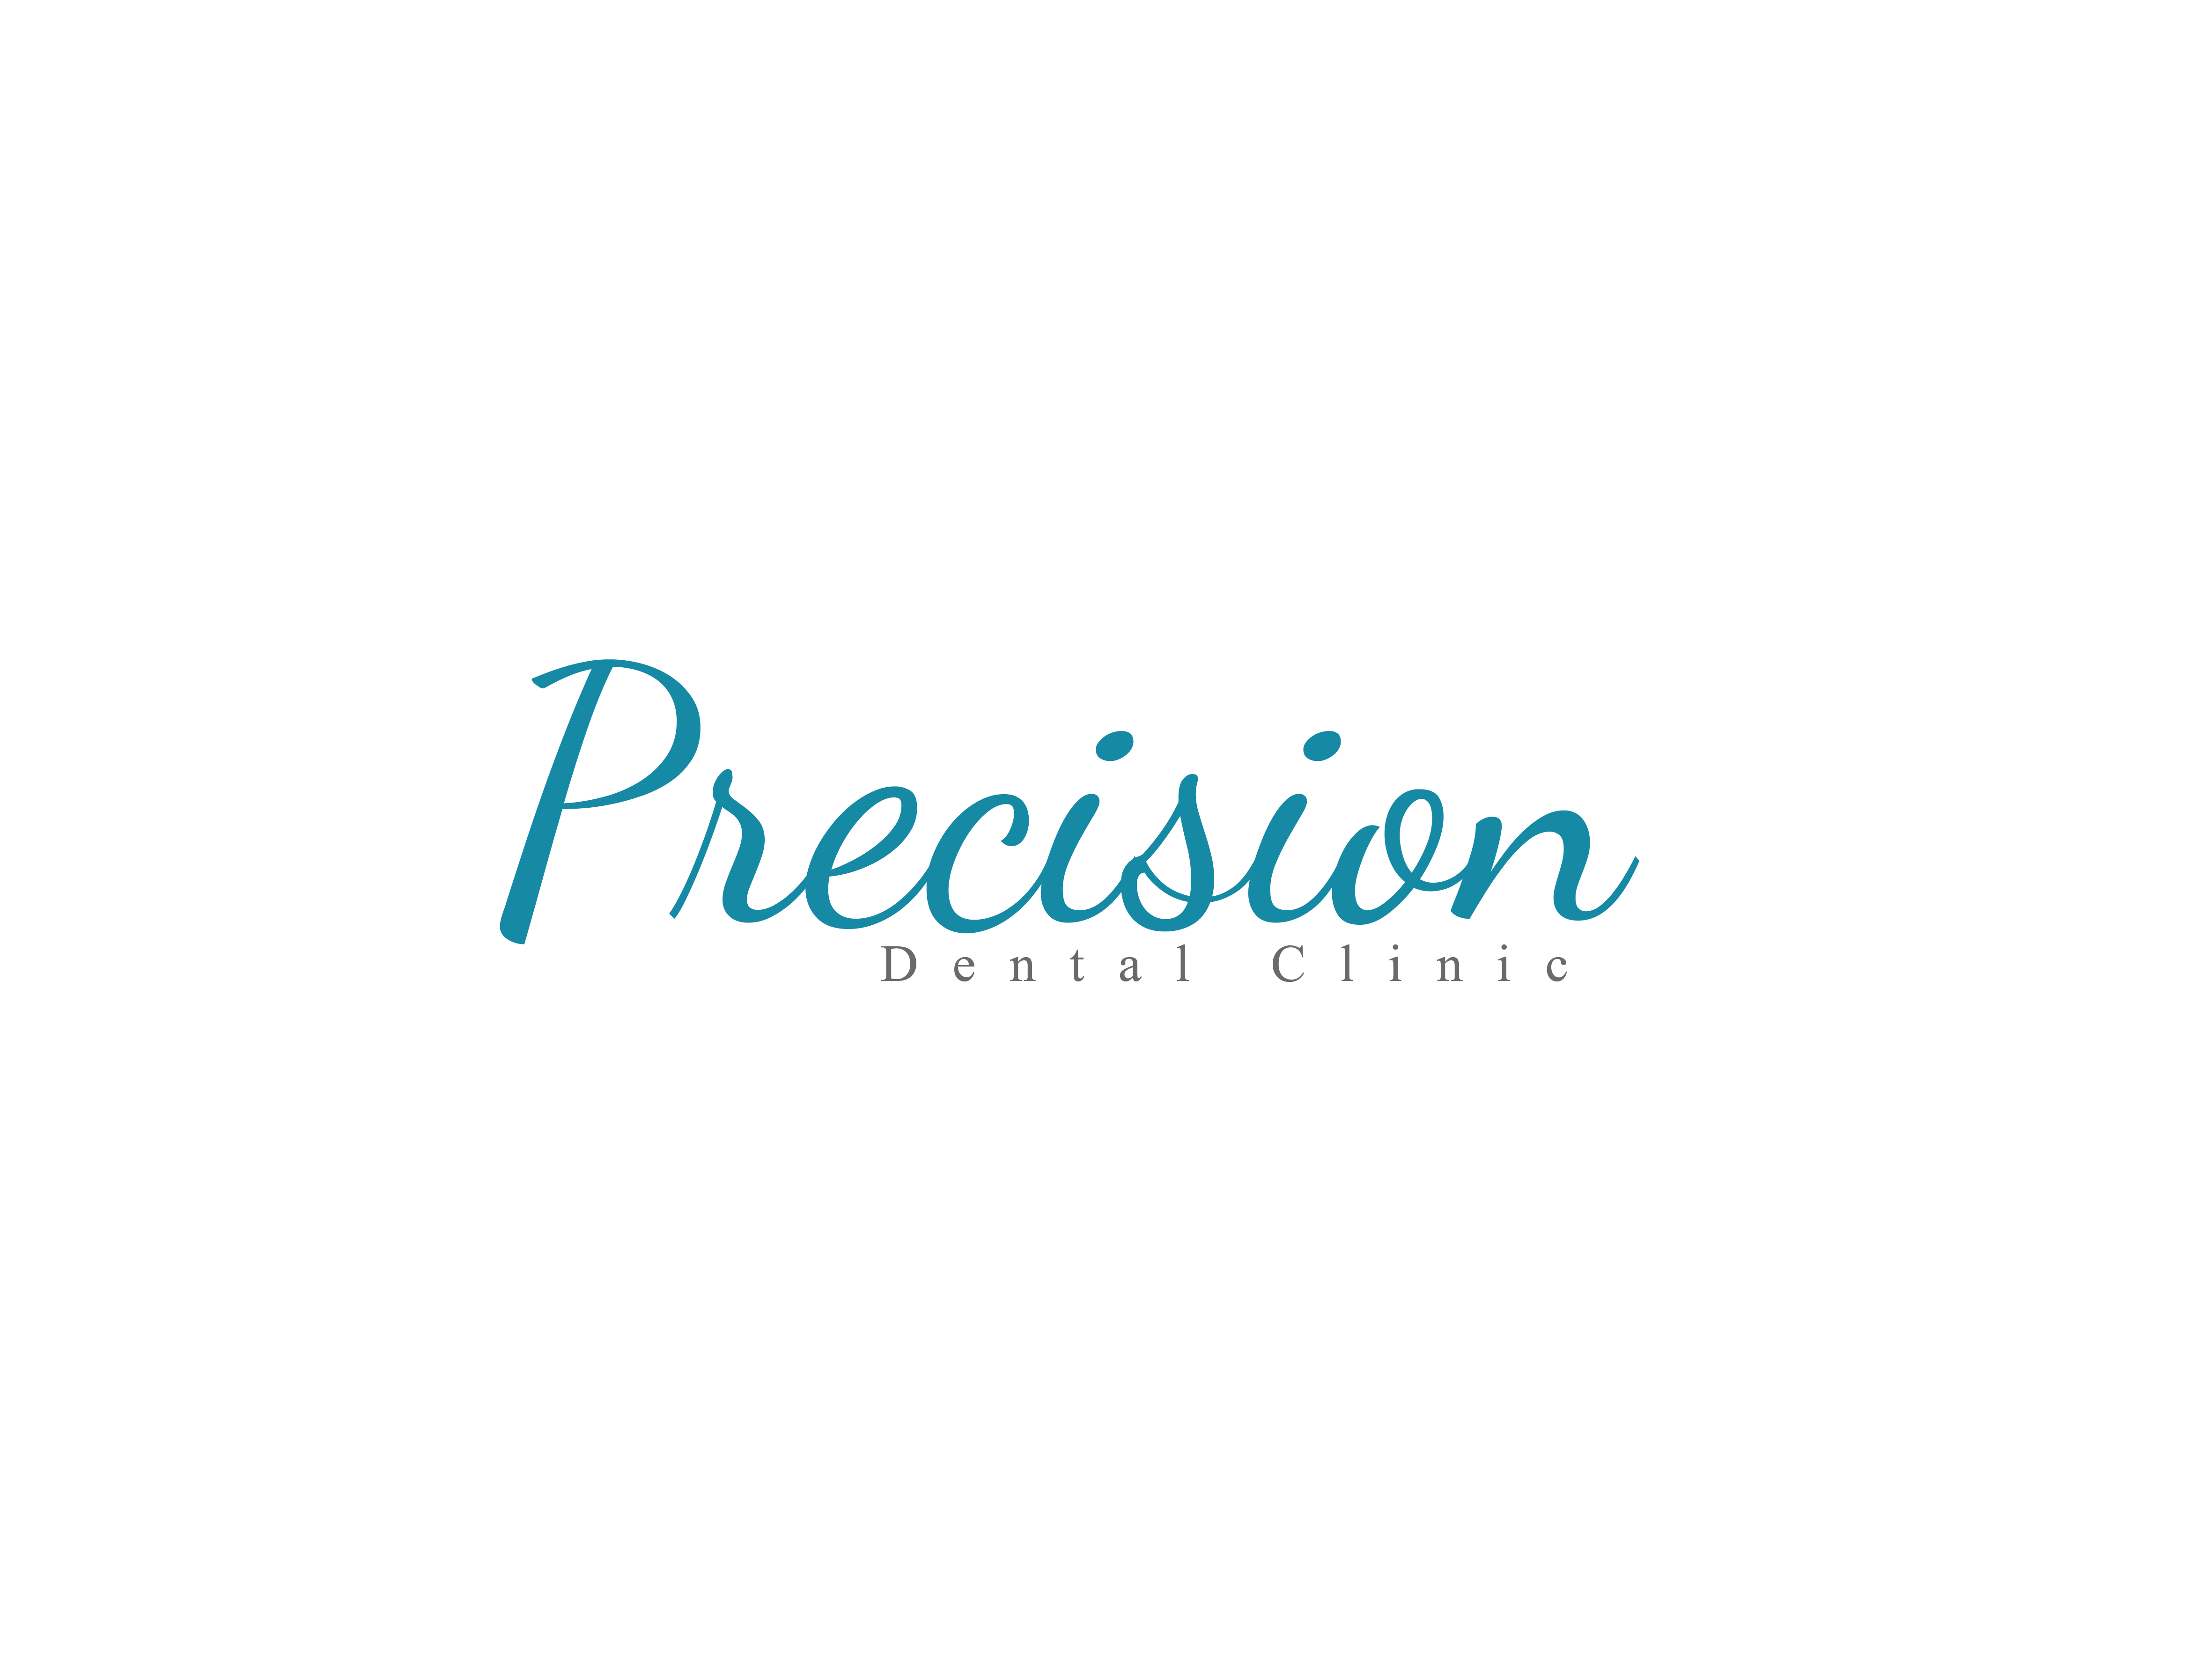 Logo Design by Private User - Entry No. 95 in the Logo Design Contest Captivating Logo Design for Precision Dental Clinic.